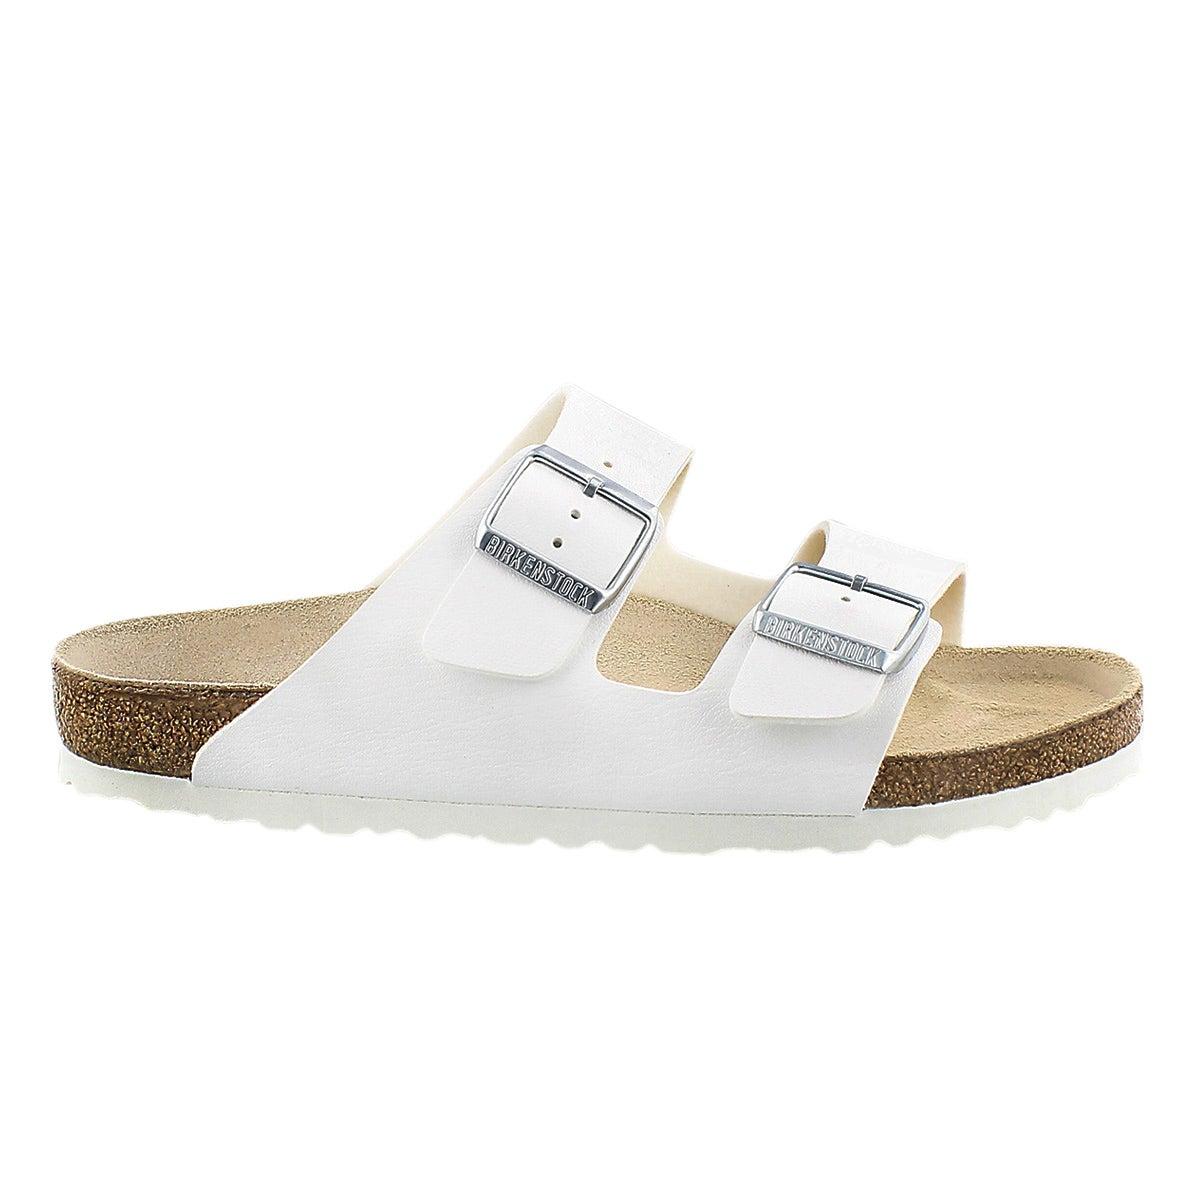 Lds Arizona wht 2 strap sandal